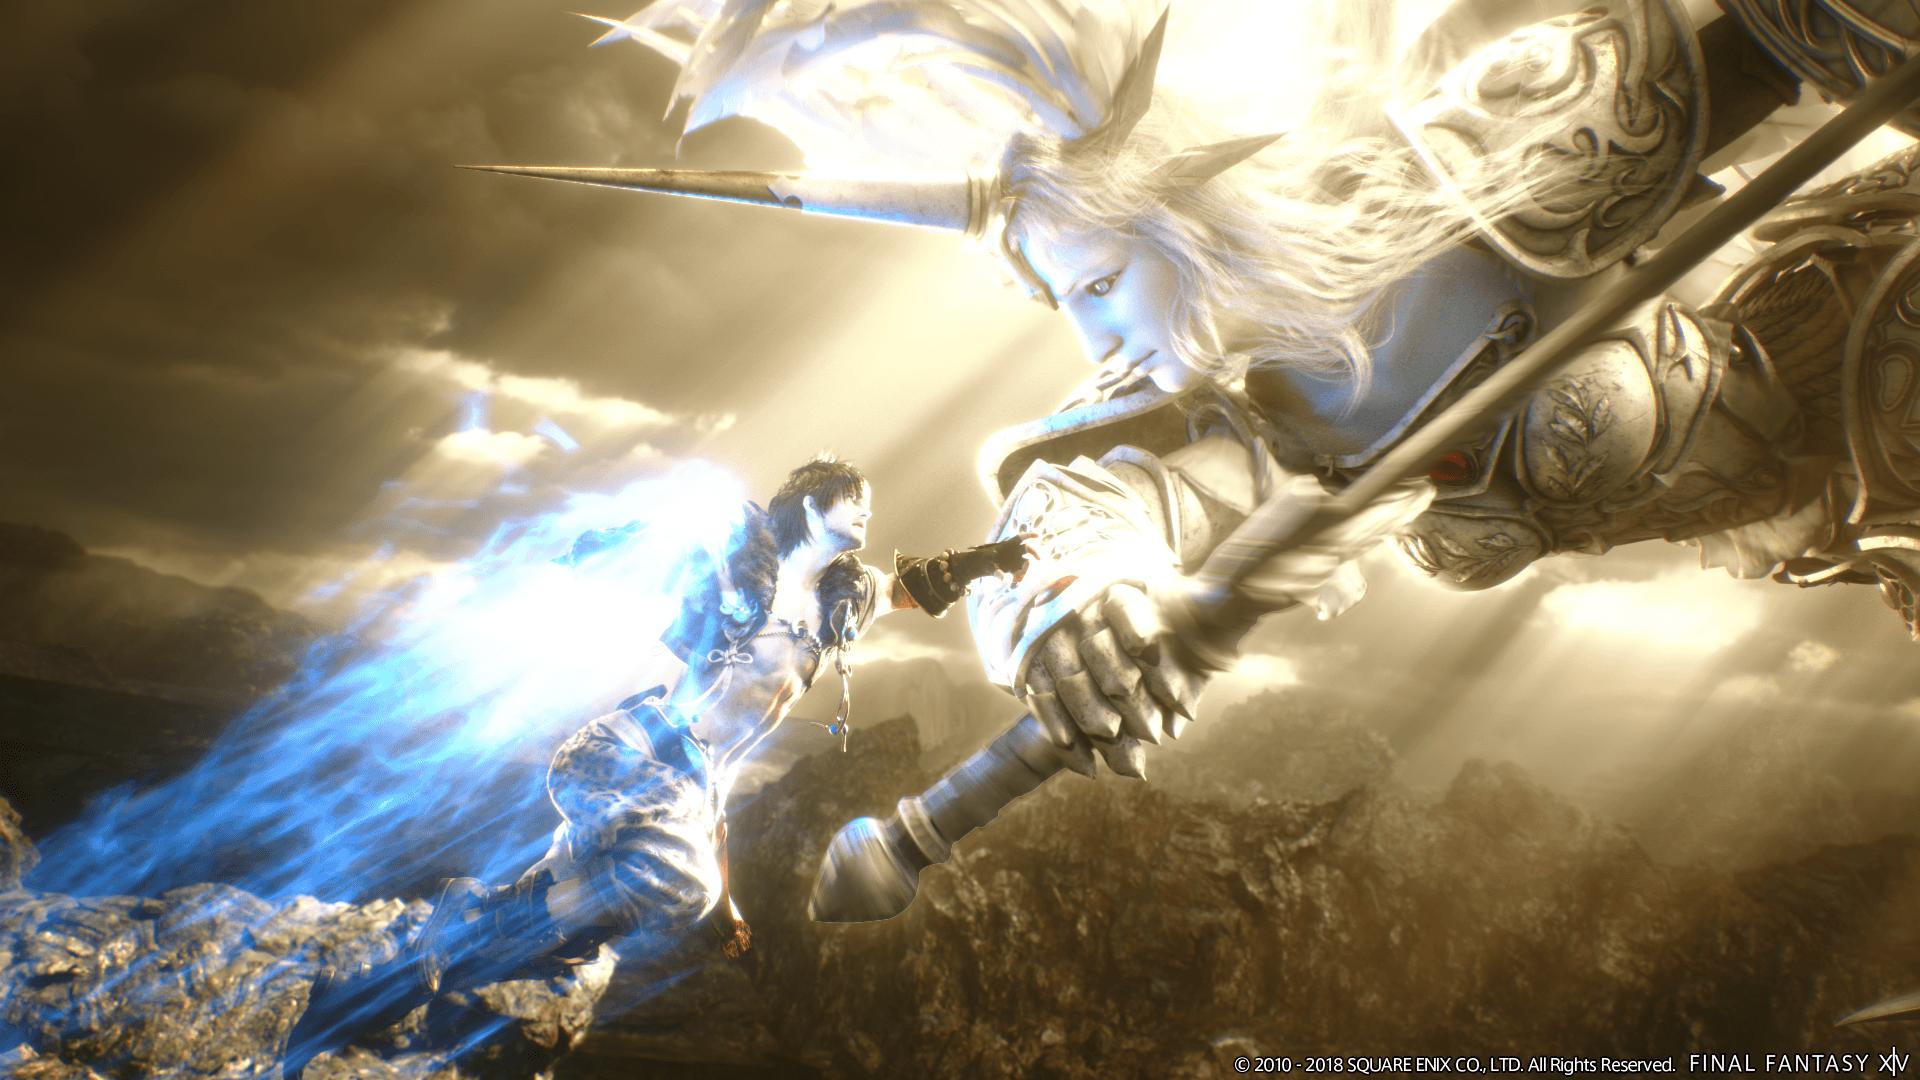 Final Fantasy XIV: Shadowbringers, Square Enix, PlayStation 4